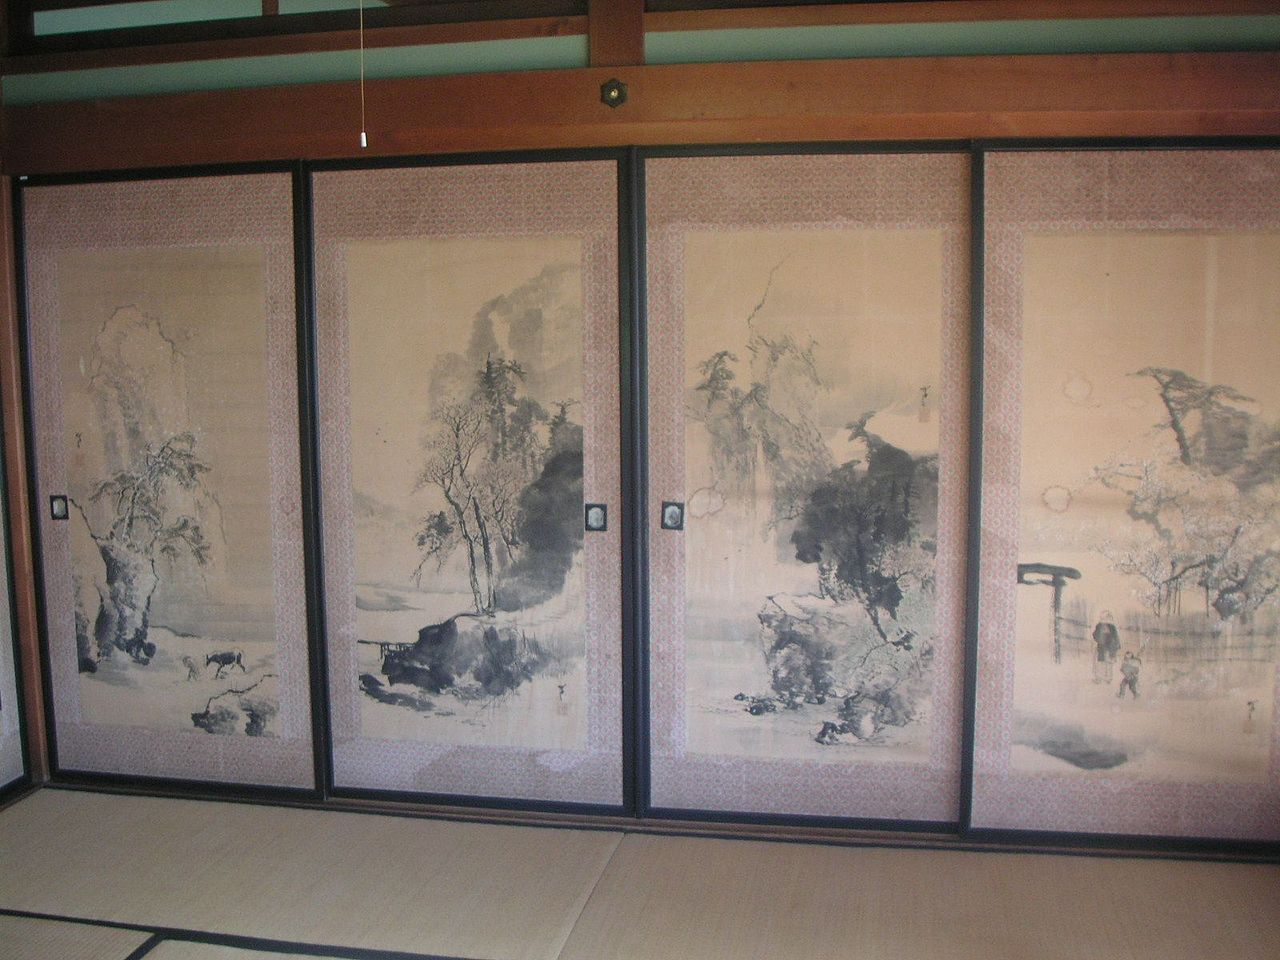 1280px-Shayokan_Osamu_Dazai_Memorial_Hall_-_Doors_to_Shayō.jpg